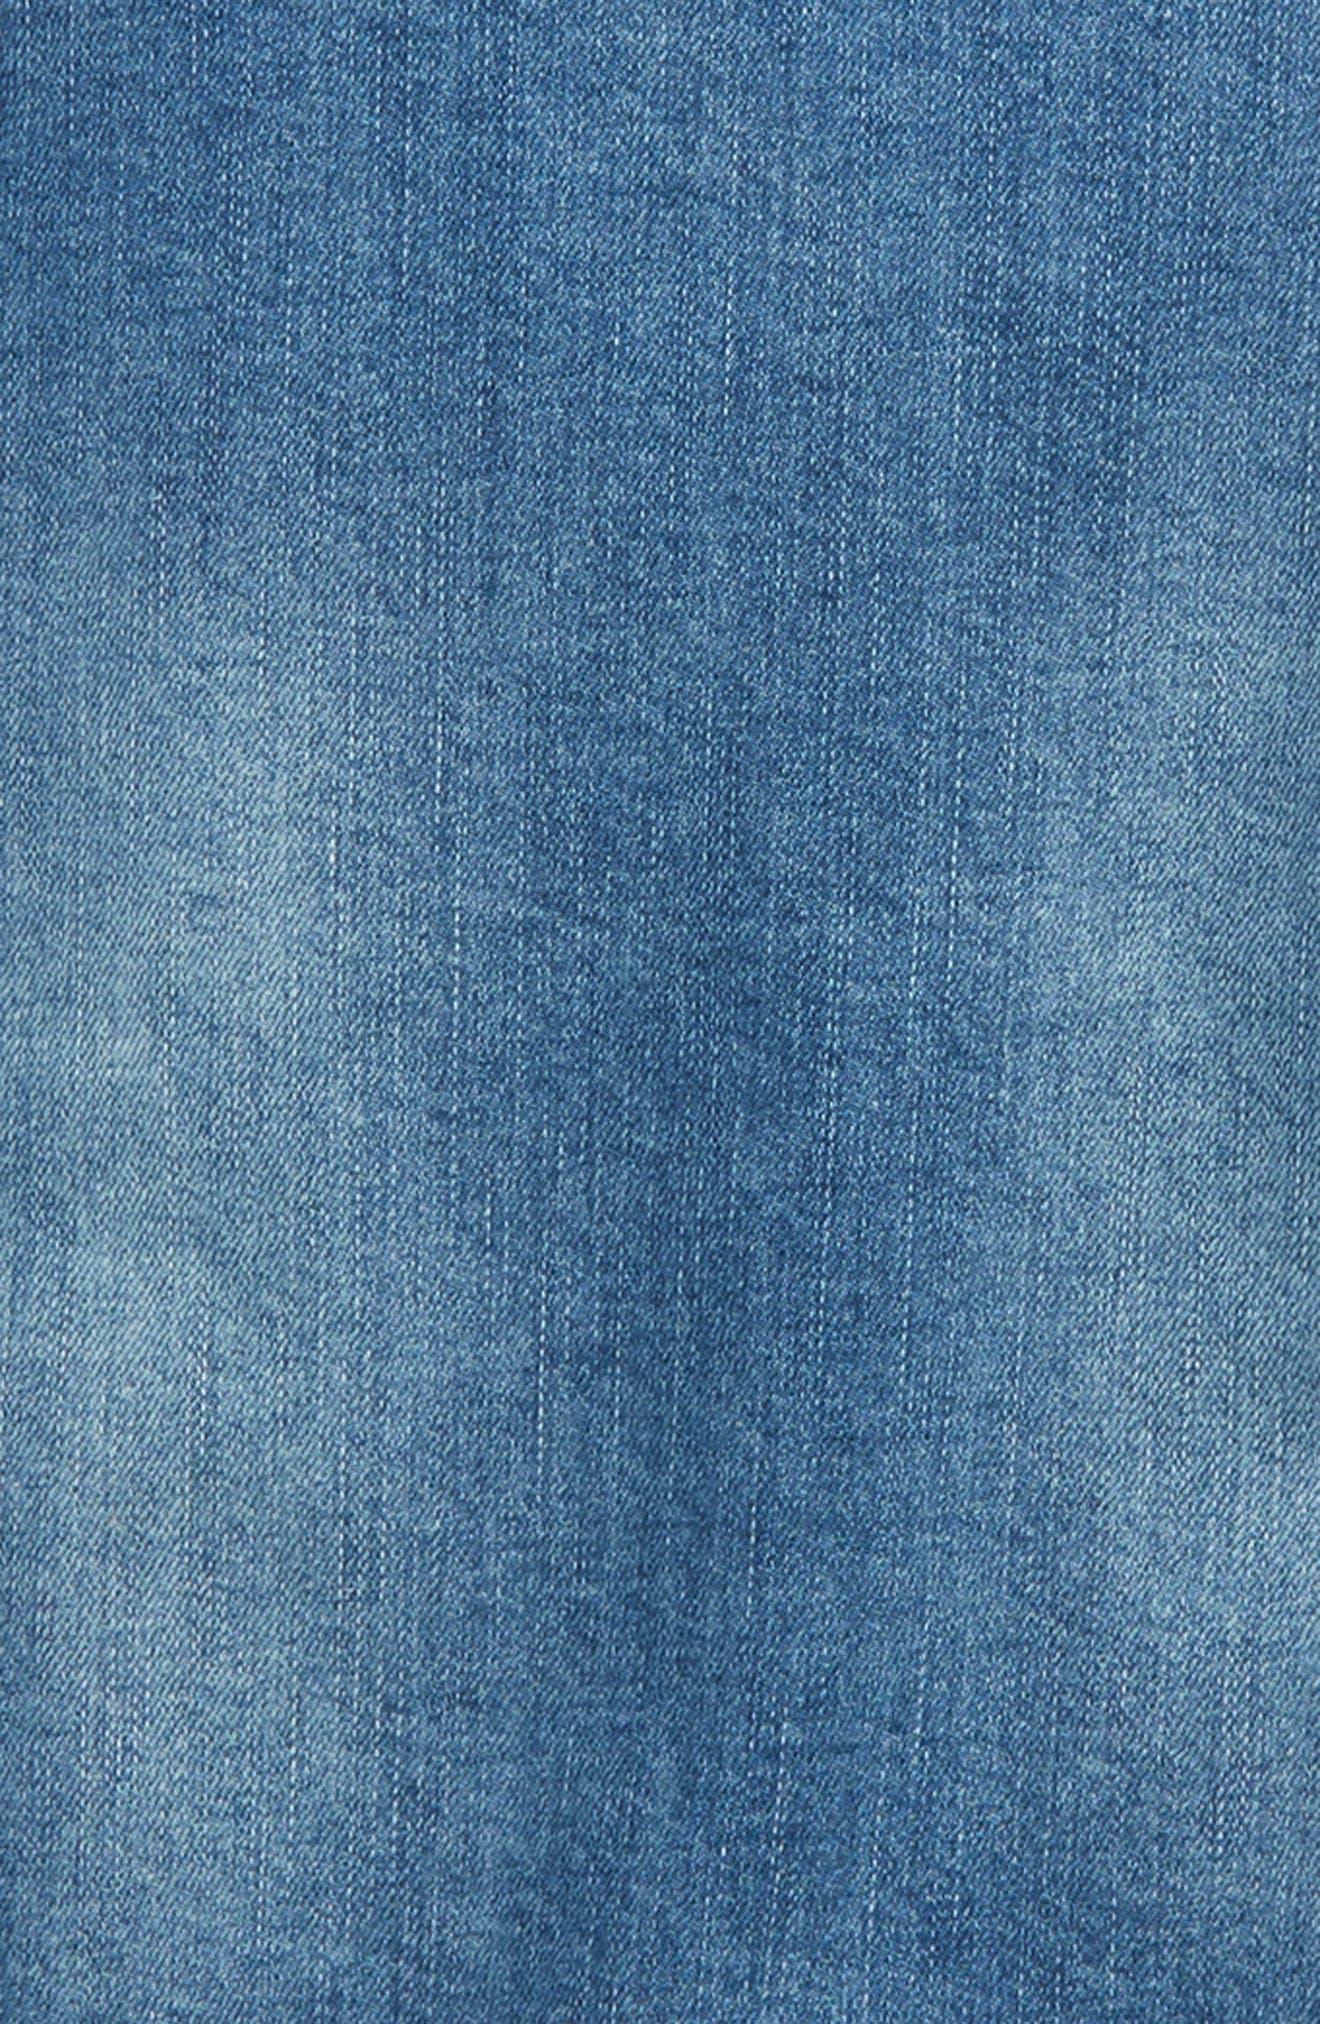 Denim Sweatshirt,                             Alternate thumbnail 2, color,                             450